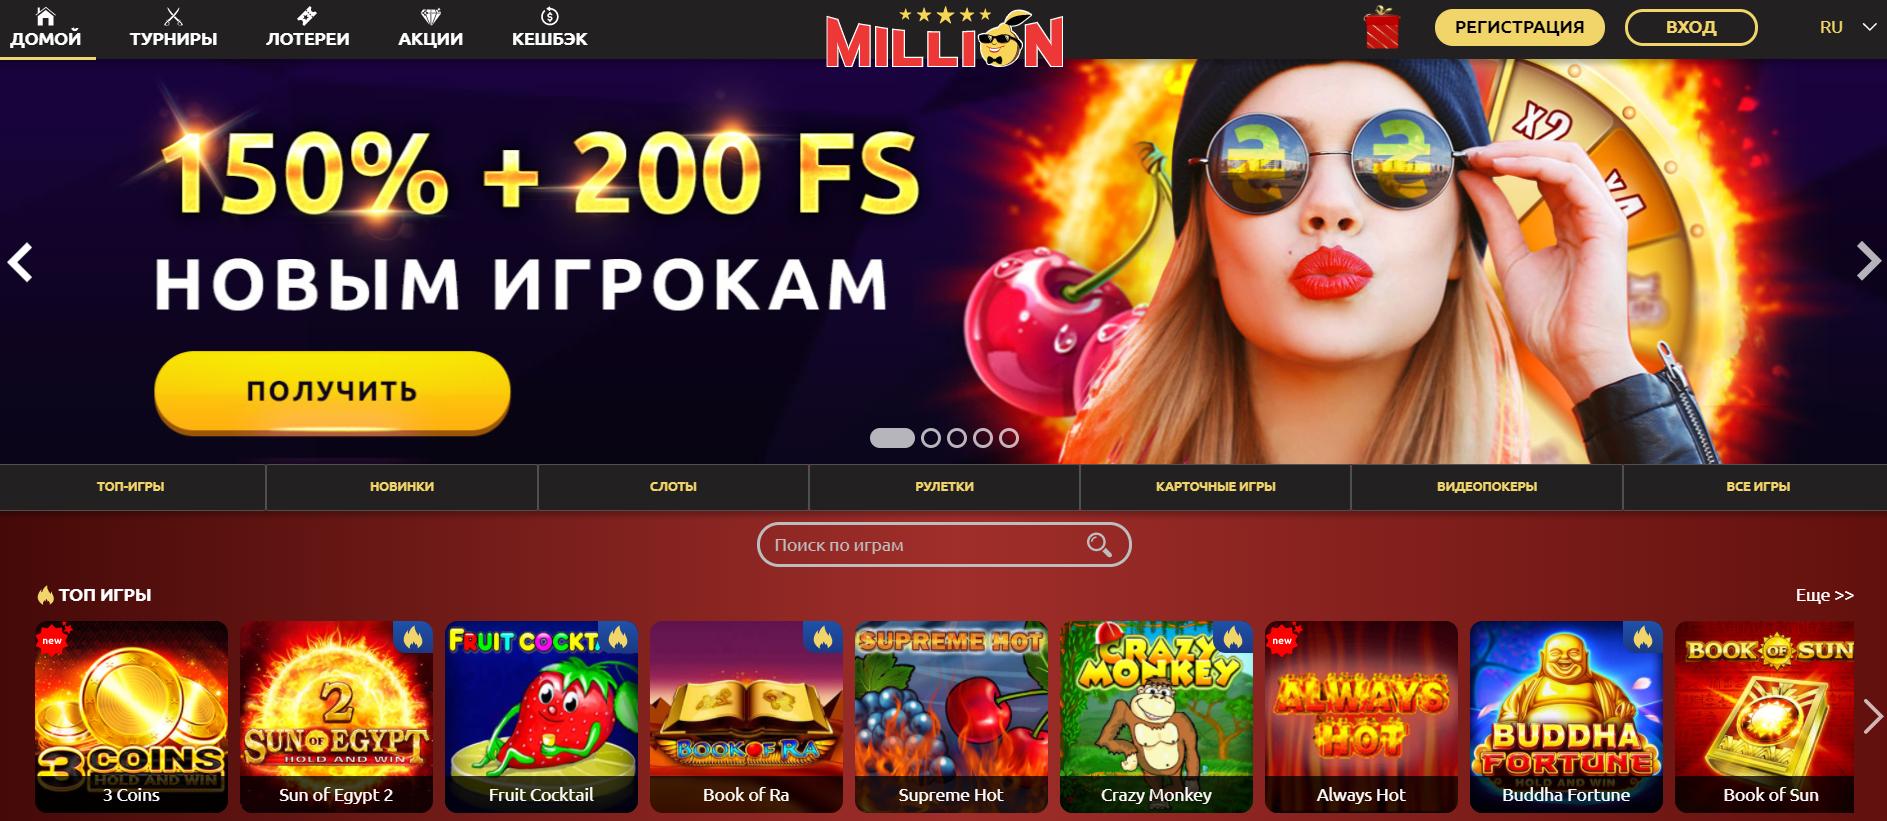 Интерфейс казино Million